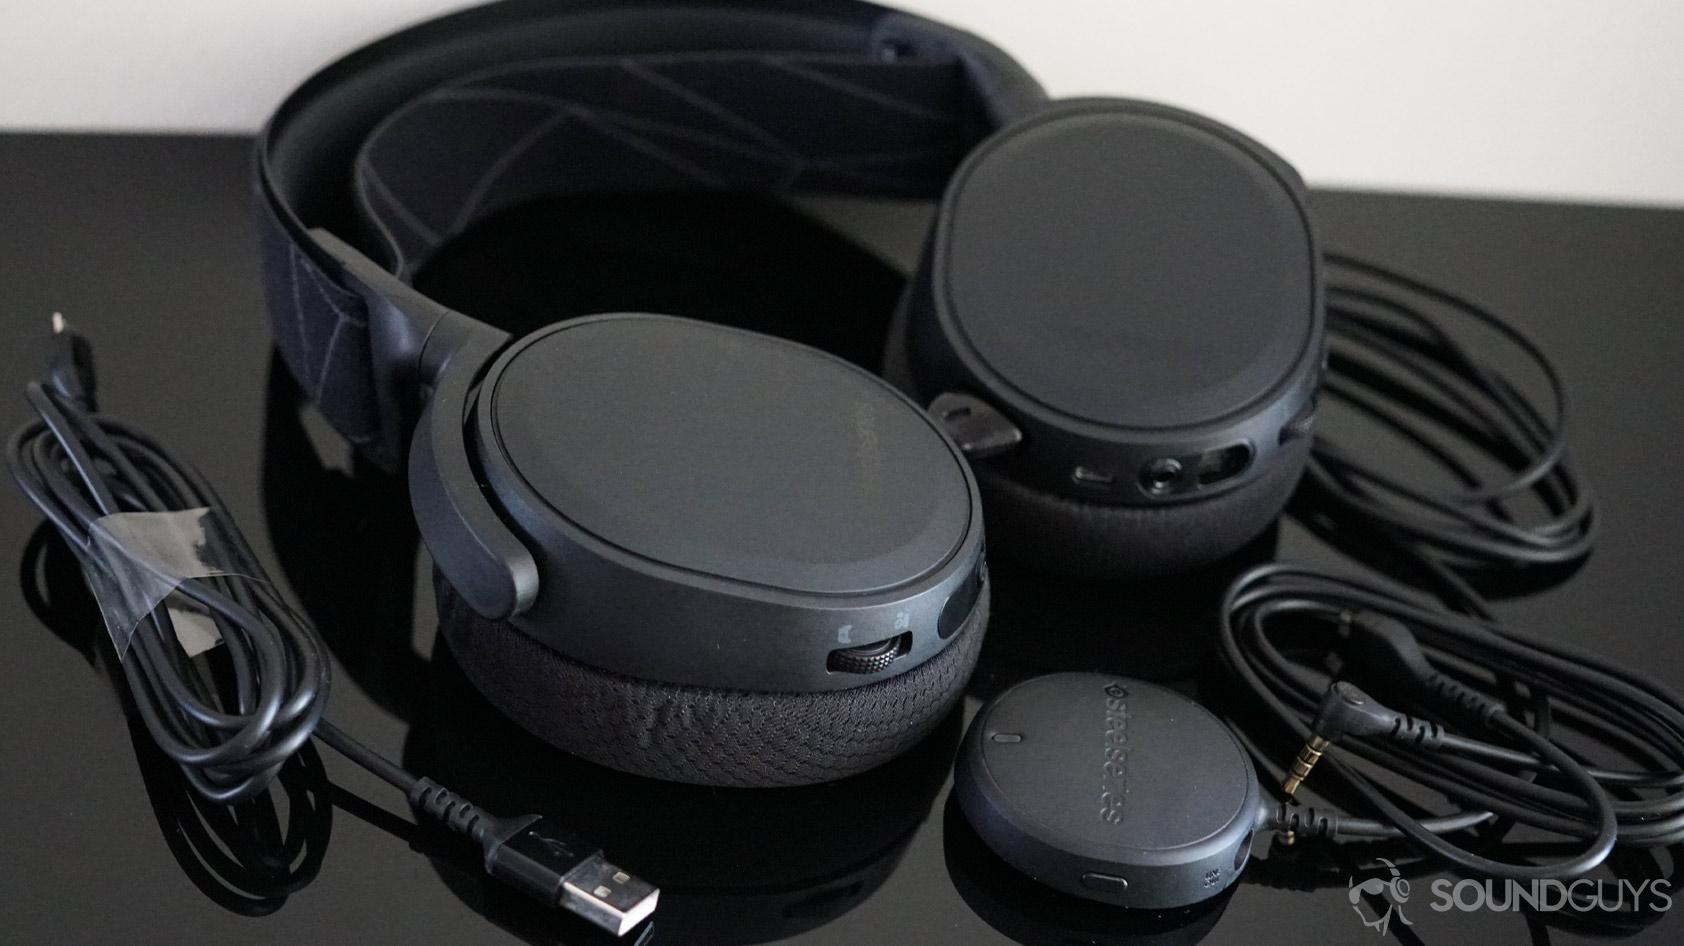 SteelSeries Arctis 7 wireless gaming headset accessories